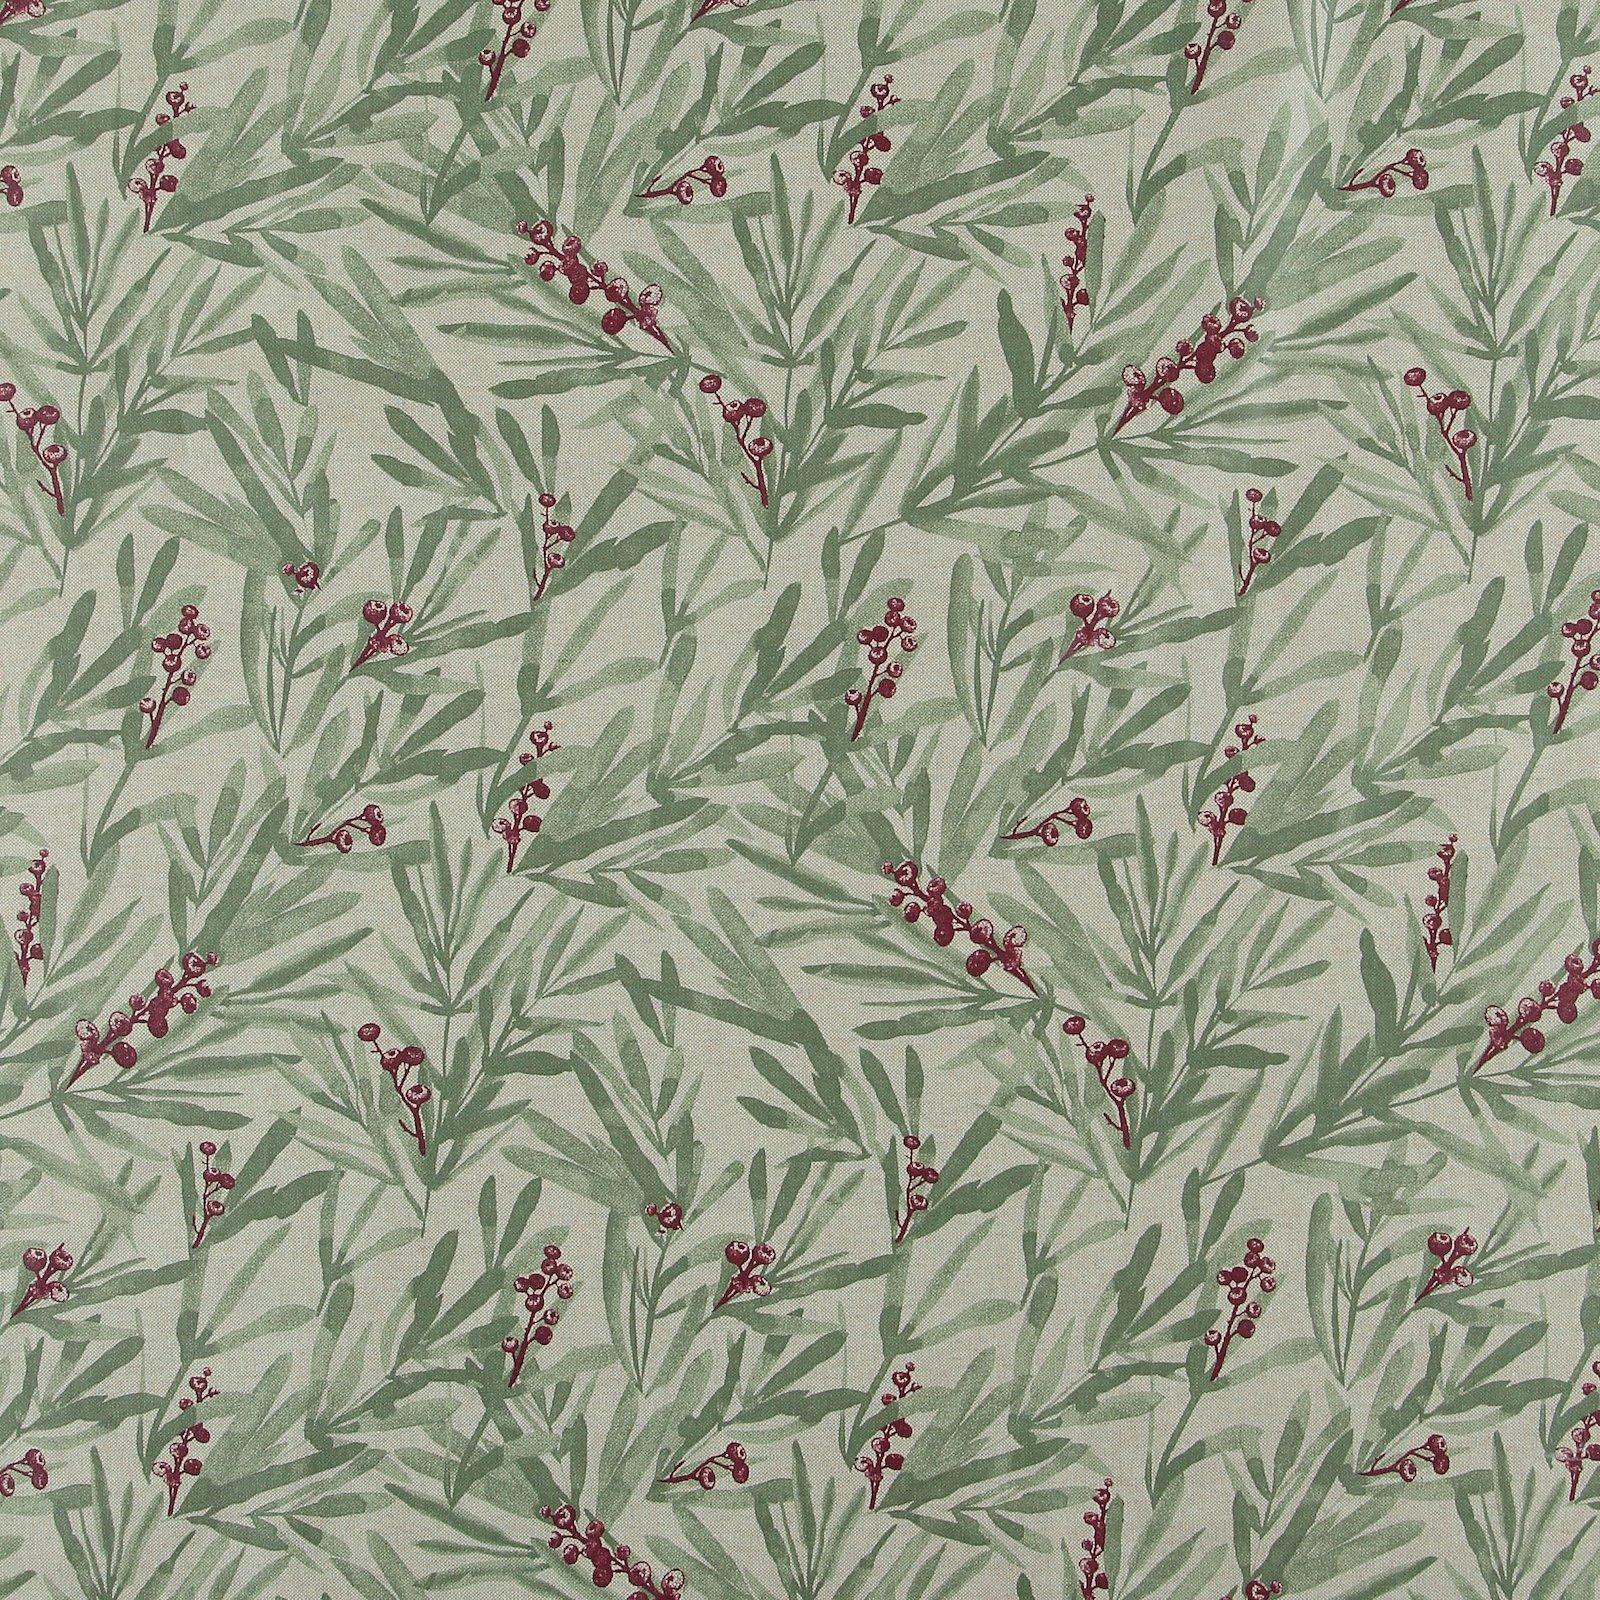 Woven oilcloth linenlook w berries 872308_pack_sp